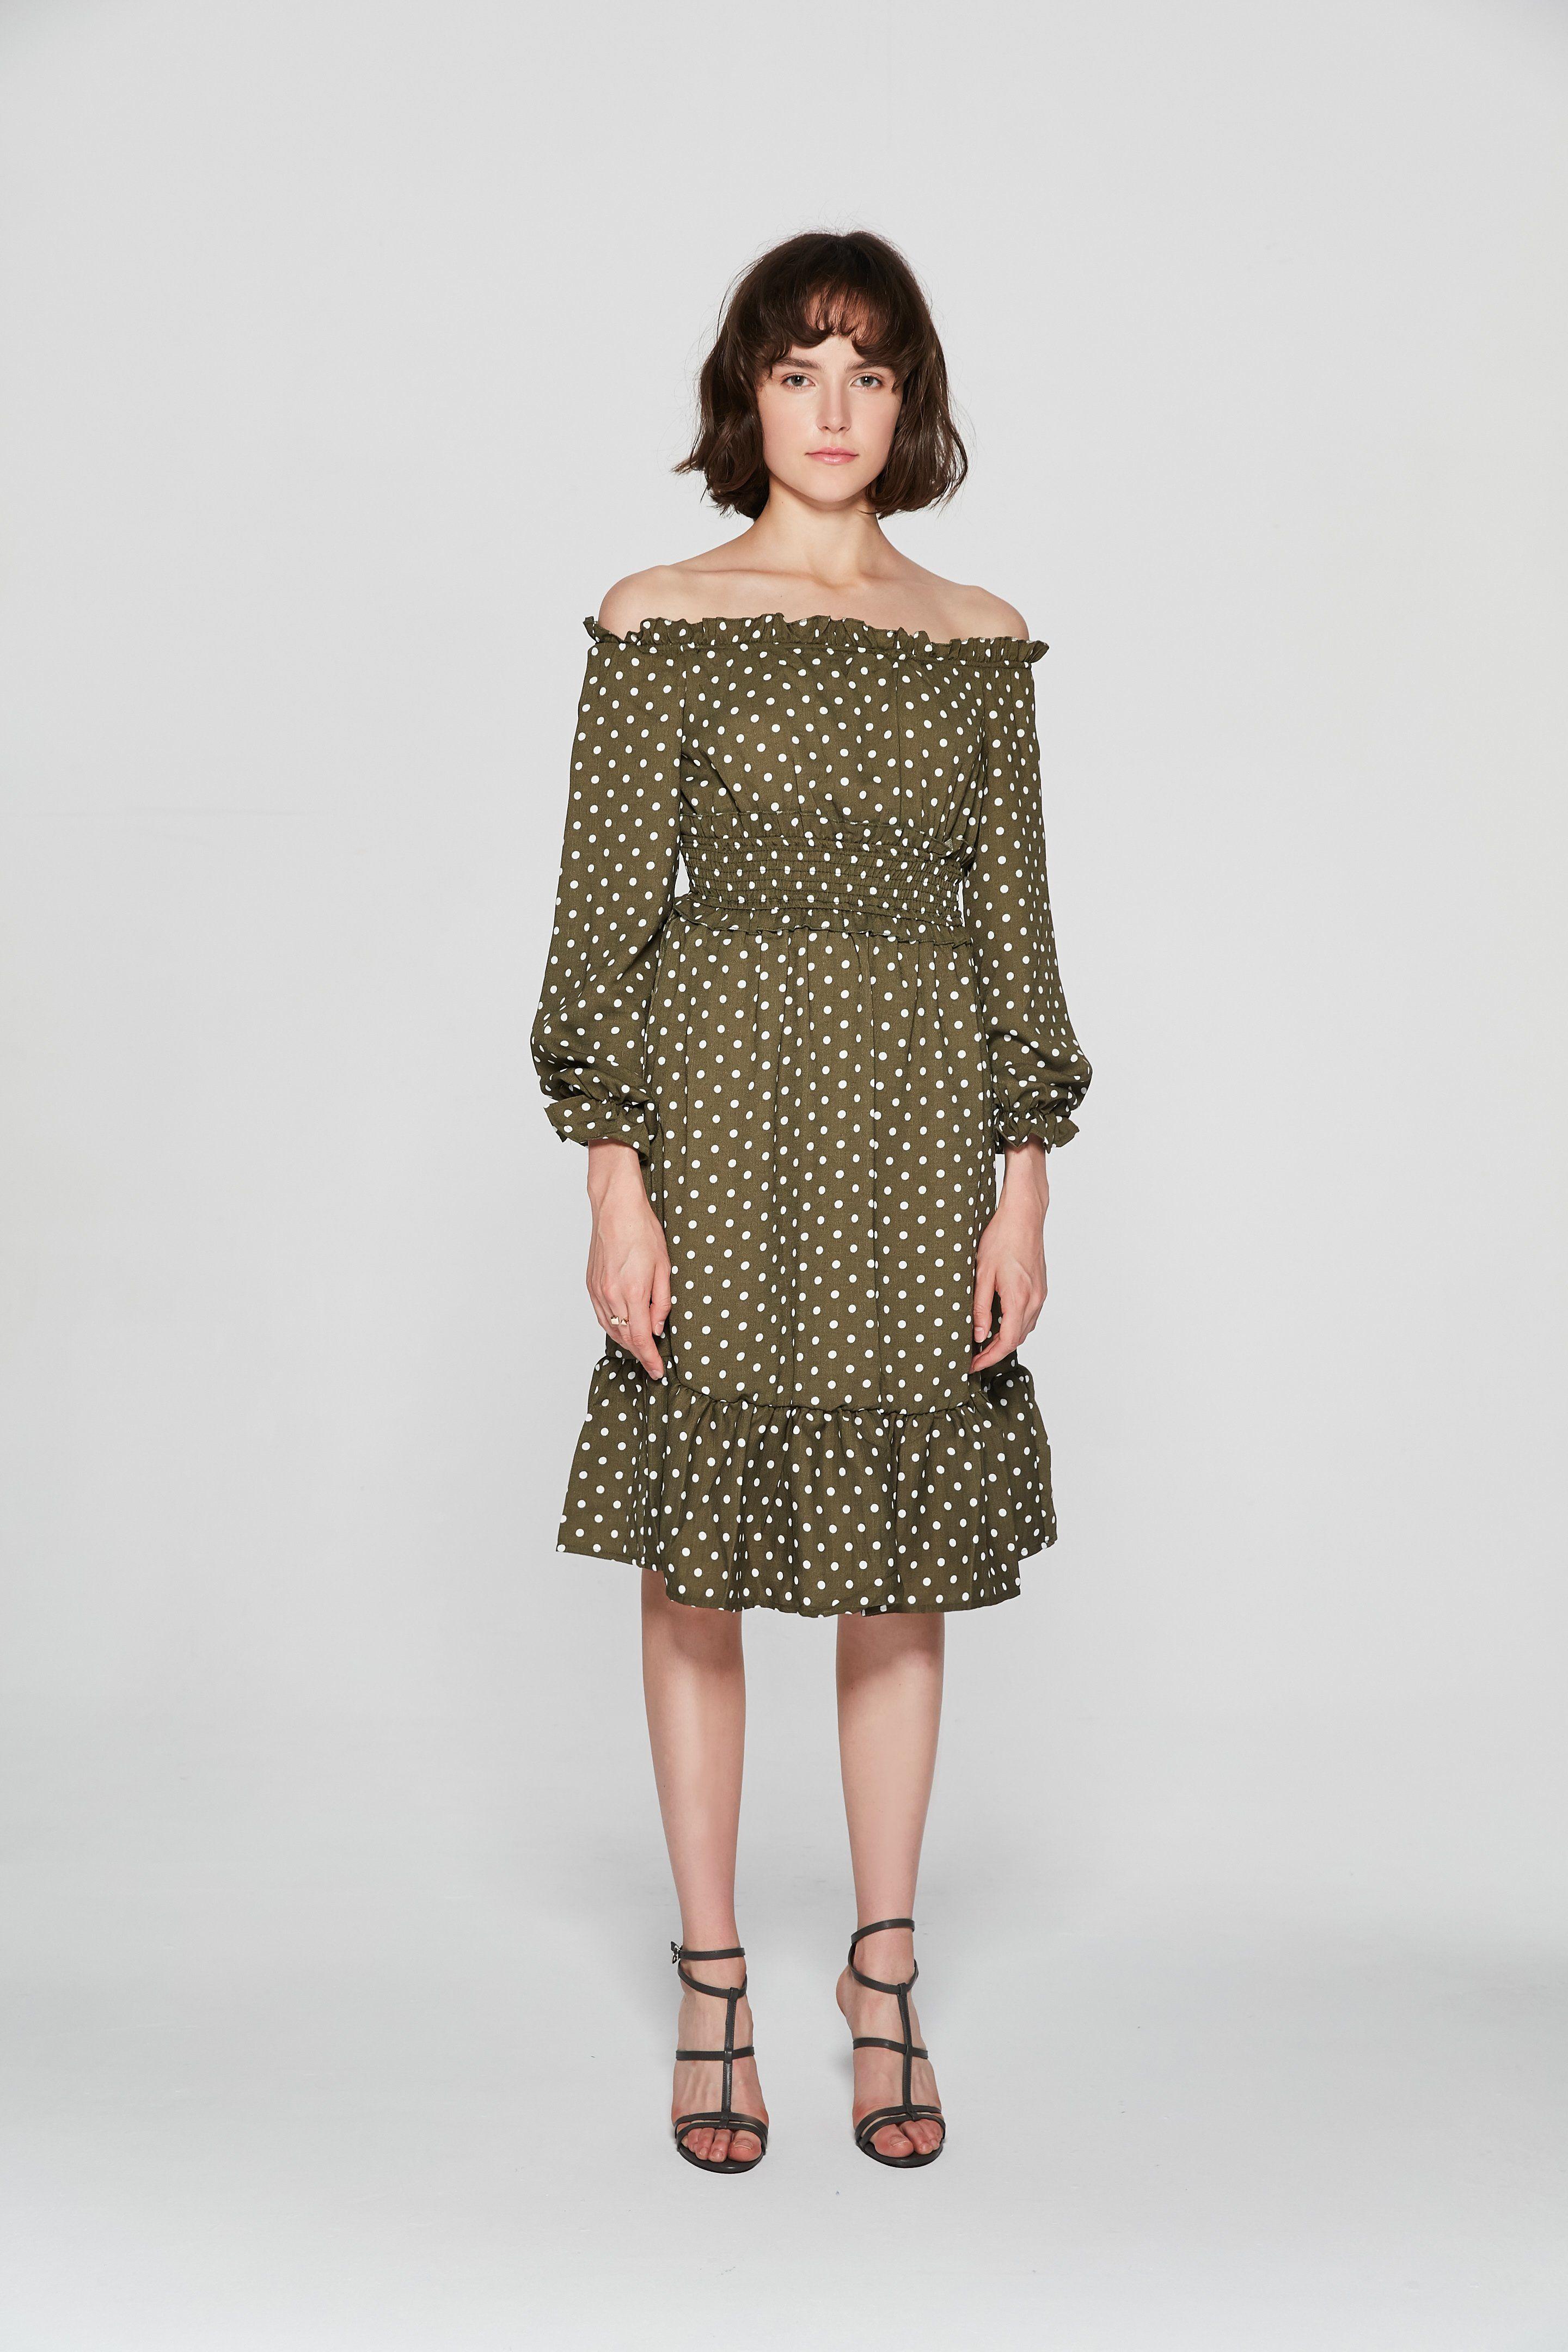 Polka dot bardot dress dr products pinterest bardot dress